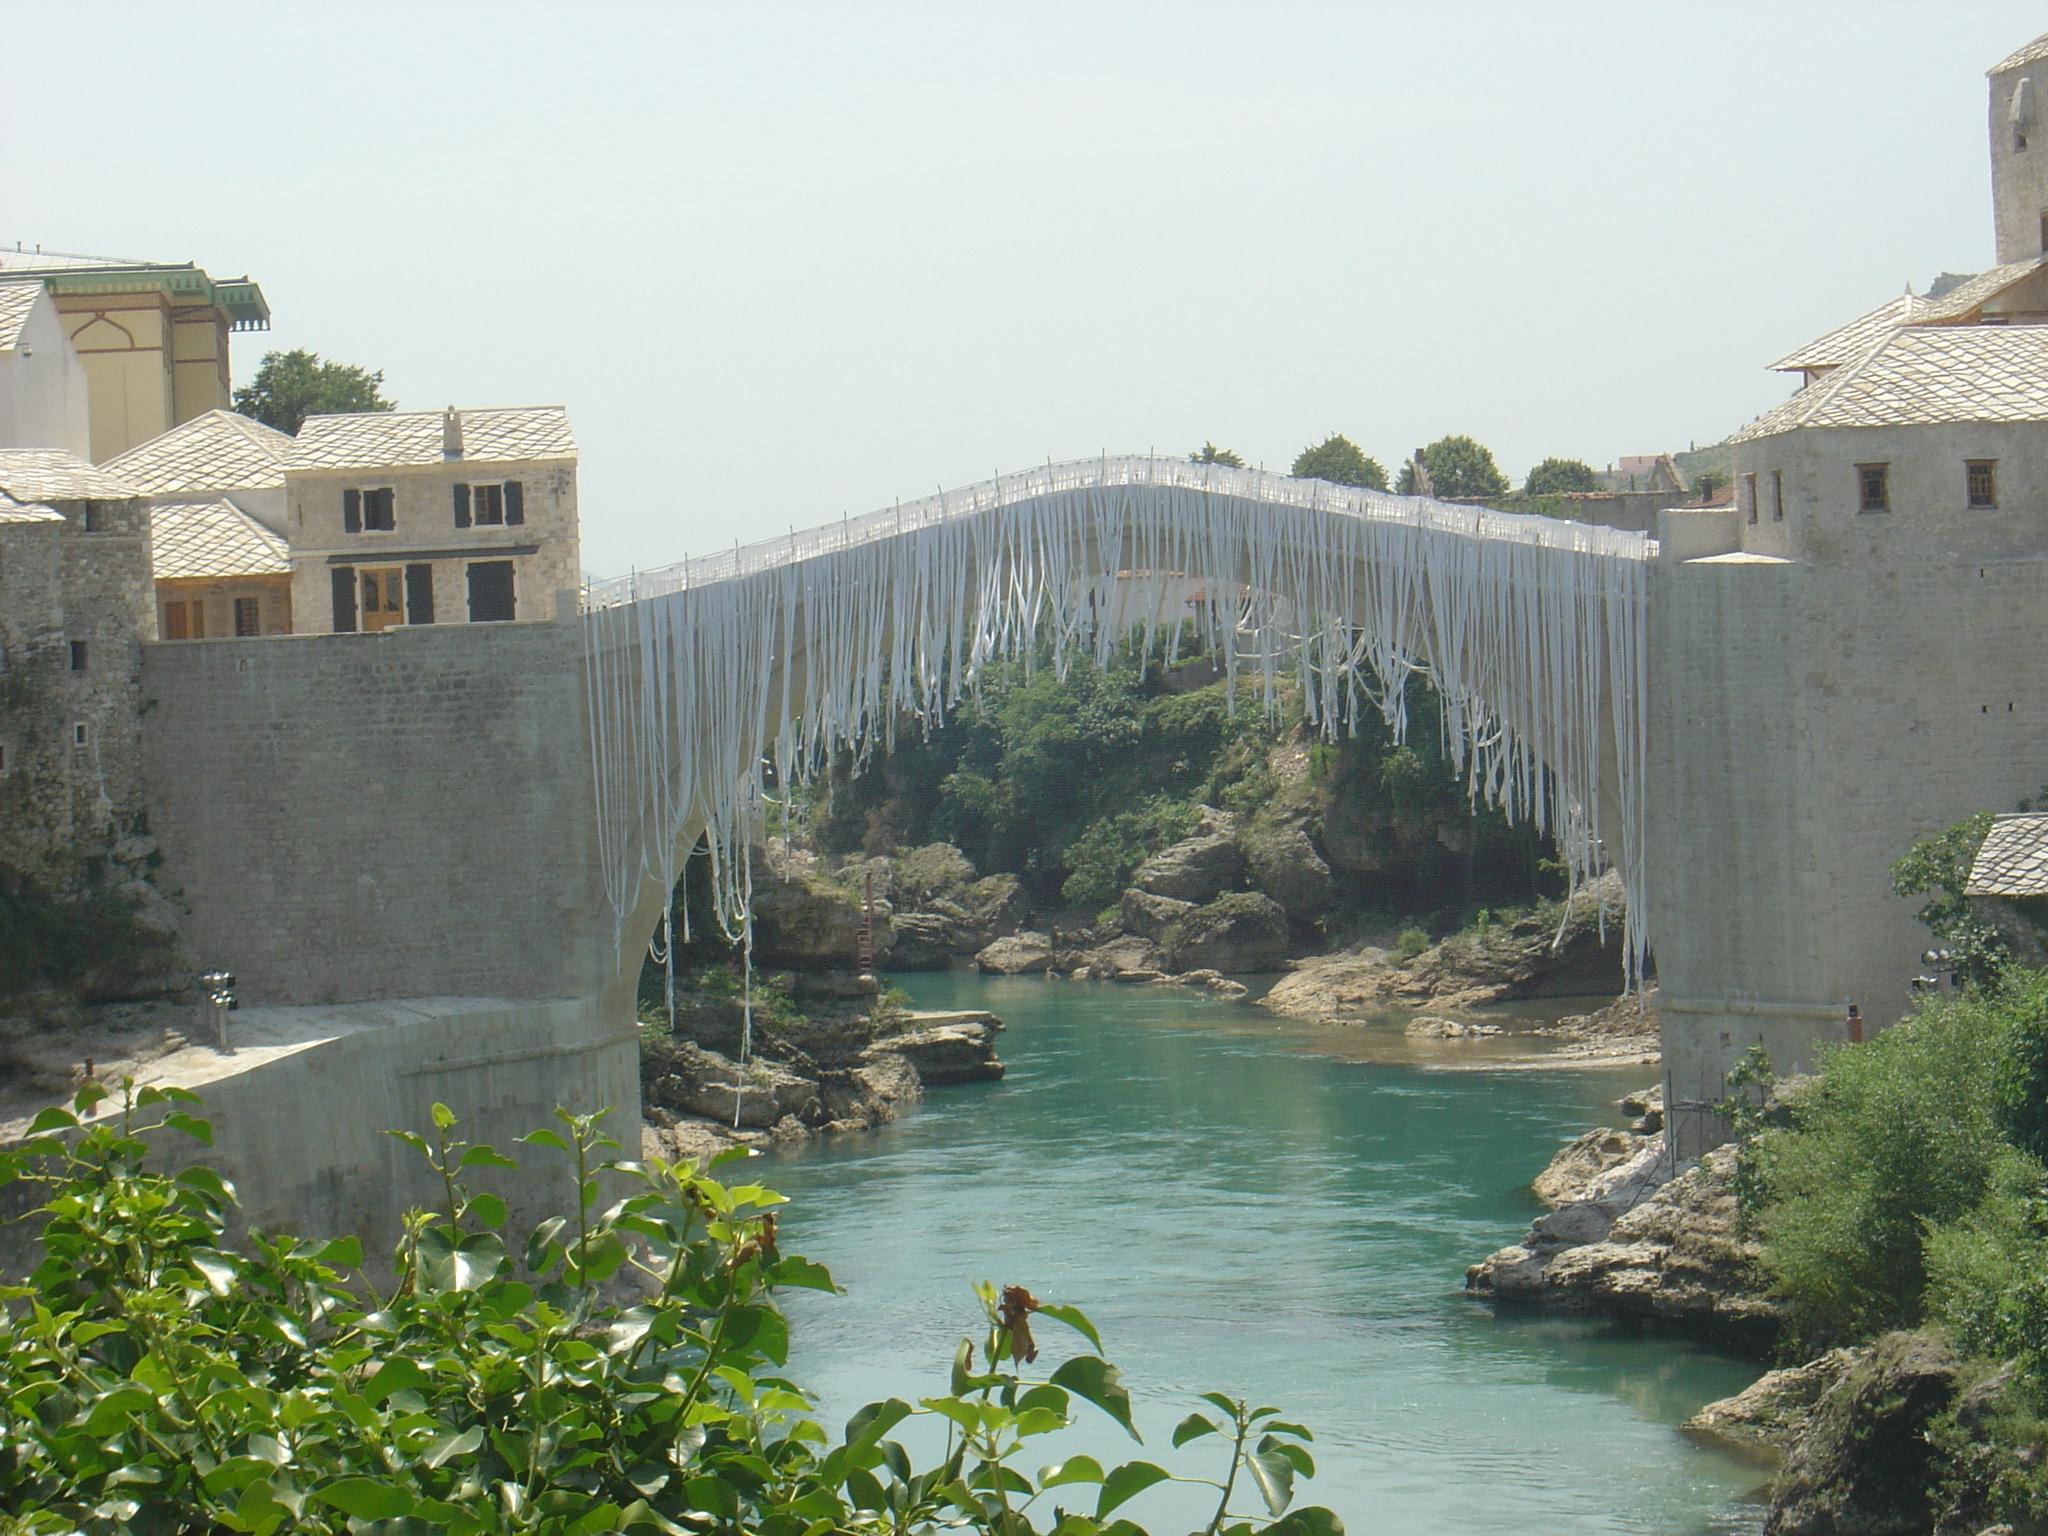 http://upload.wikimedia.org/wikipedia/commons/4/4e/Mostar_Stari_Most_Juni_2004.jpg